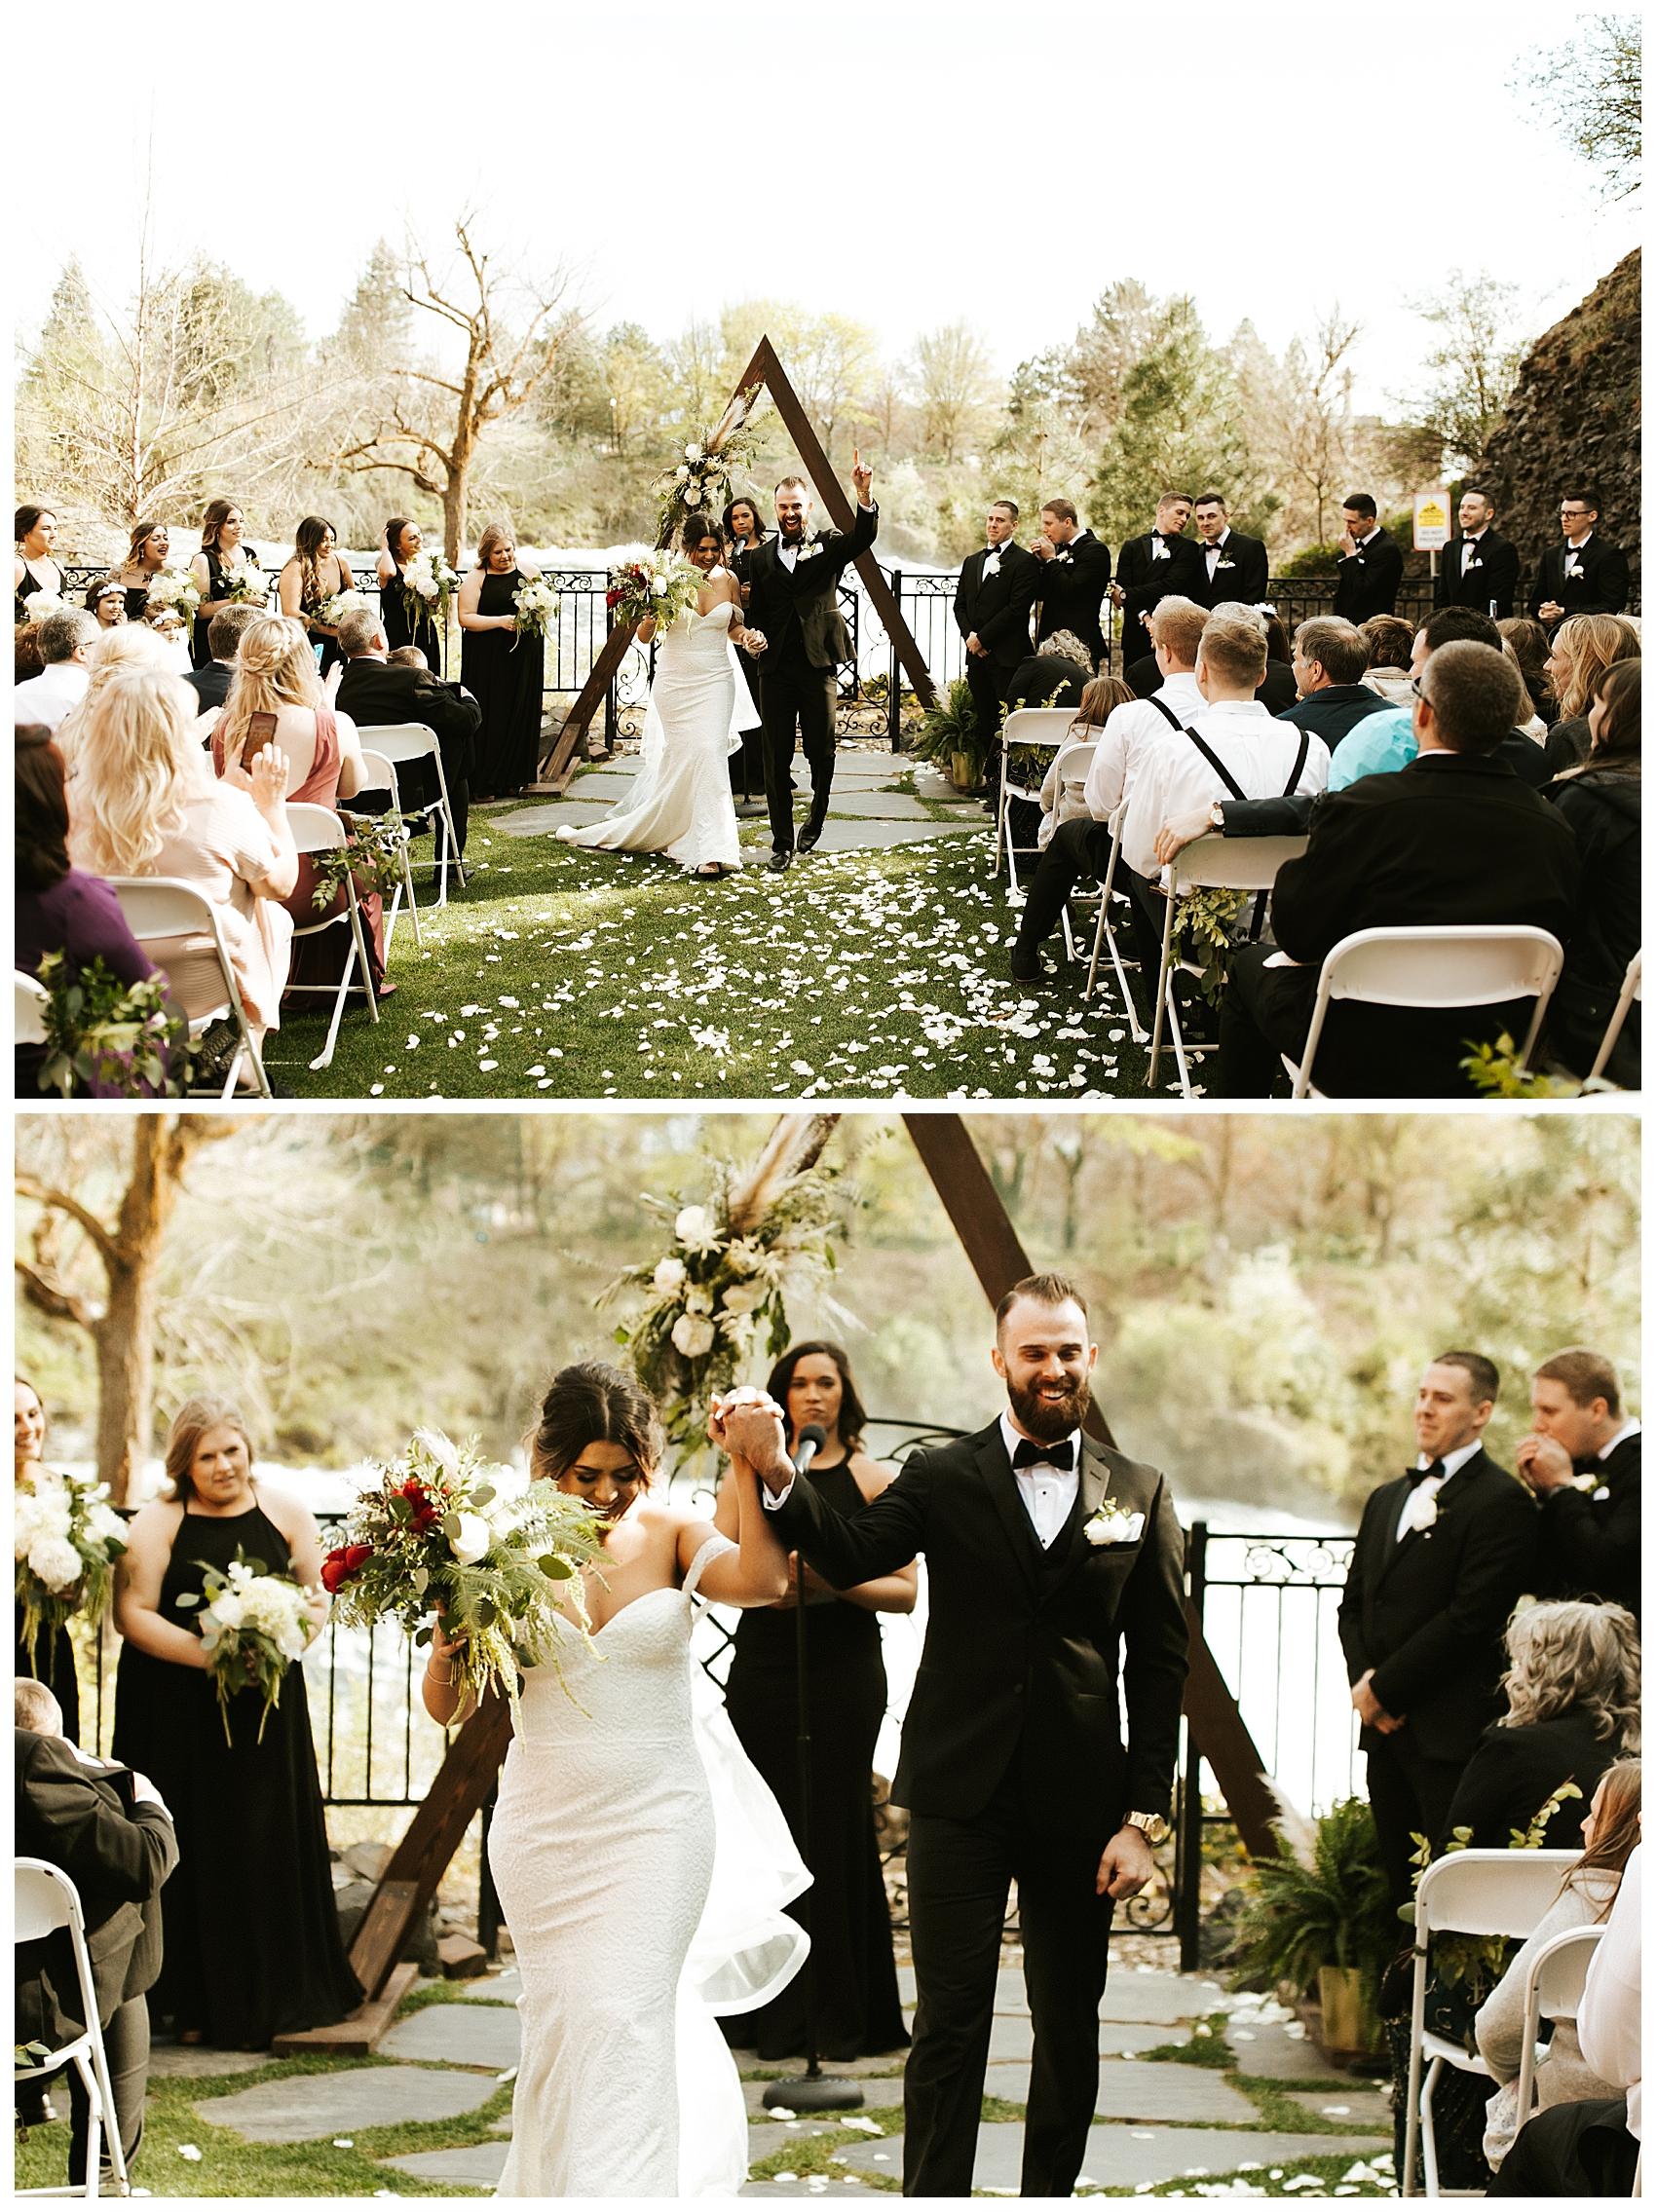 Chateau Rive Spokane Wedding Cassie Trottier Photography01061.jpg